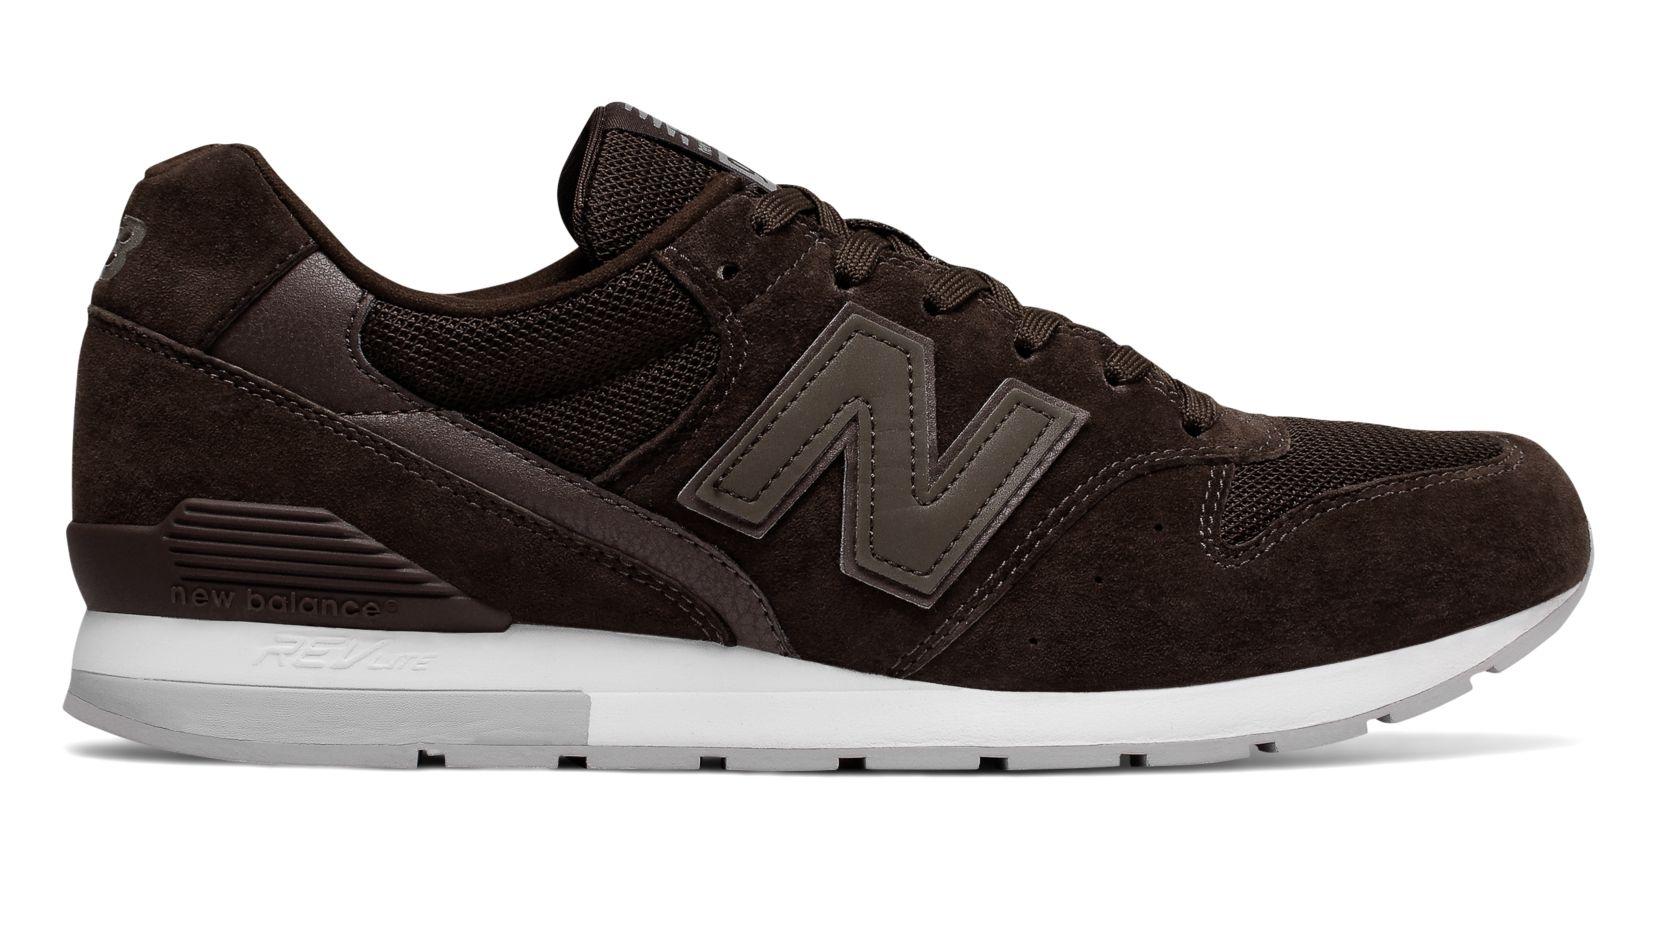 Nike Chaussures CLASSIC CORTEZ NYLON Nike soldes Clarks Glenrise